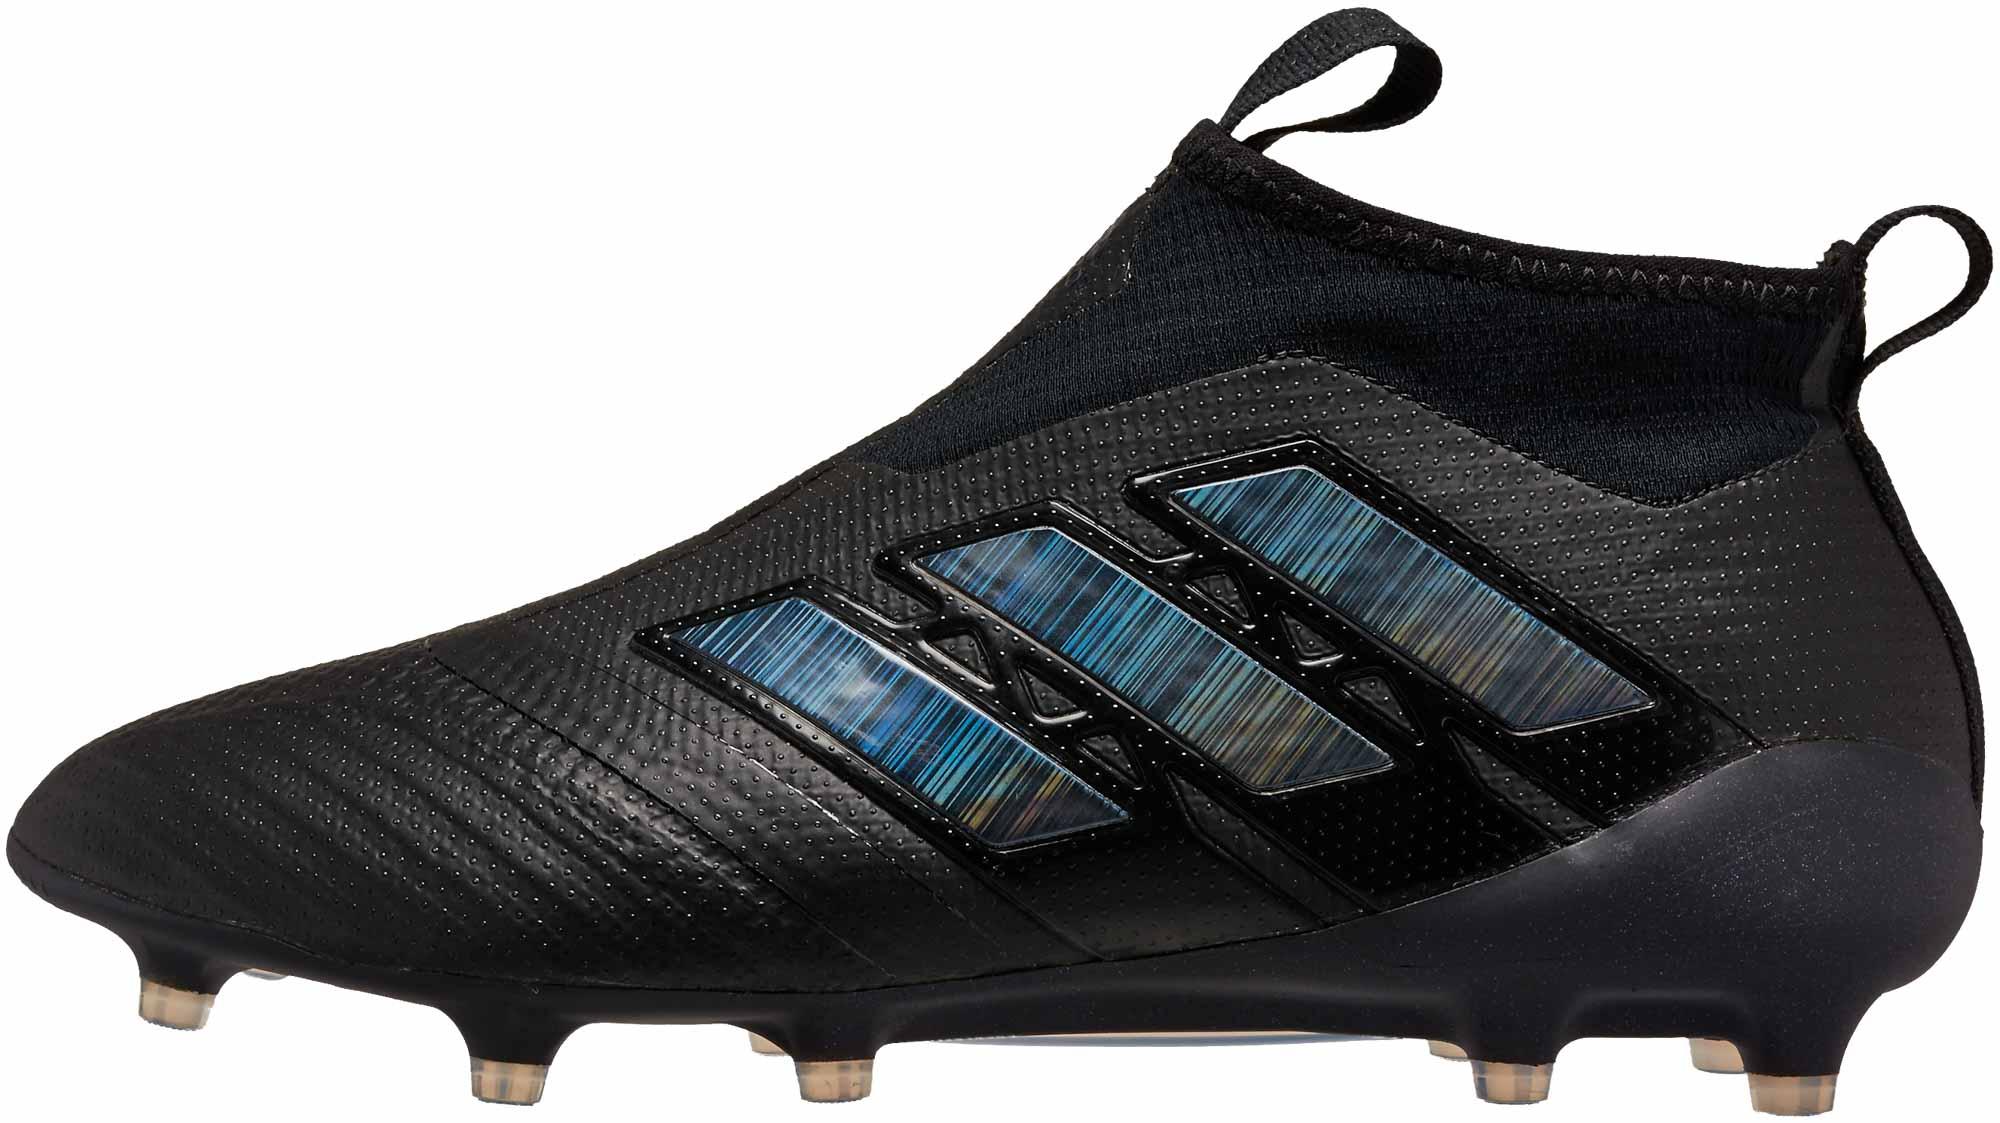 designer fashion 3b901 f3eb4 adidas ACE 17+ Purecontrol FG Soccer Cleats - Black ...